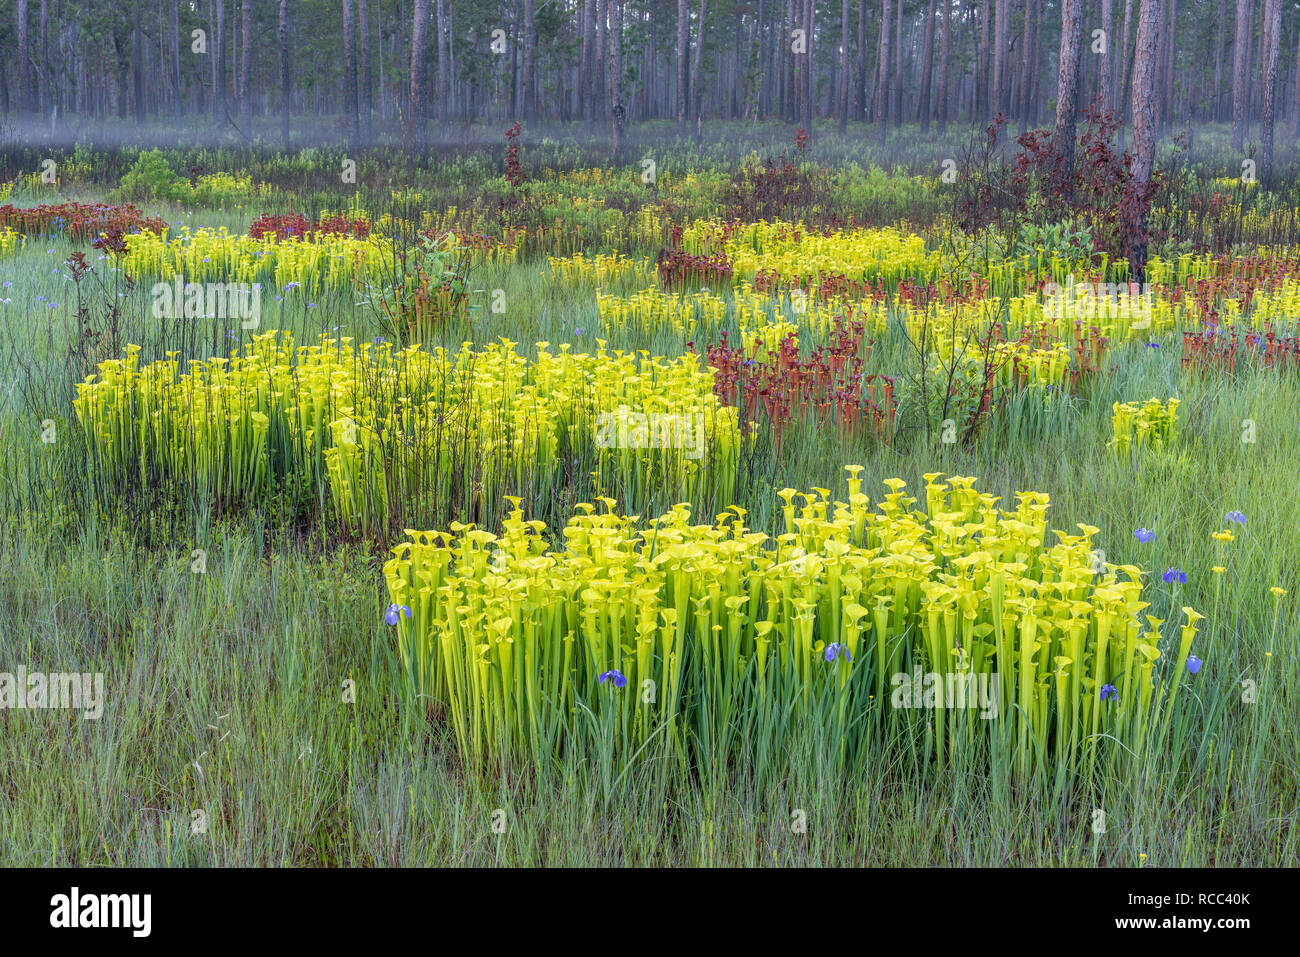 Yellow Trumpet Pitcher plants (Sarracenia flava) Post burn growth on a foggy morning along the perimeter of a carolina bay. Francis Marion NF, SC. - Stock Image